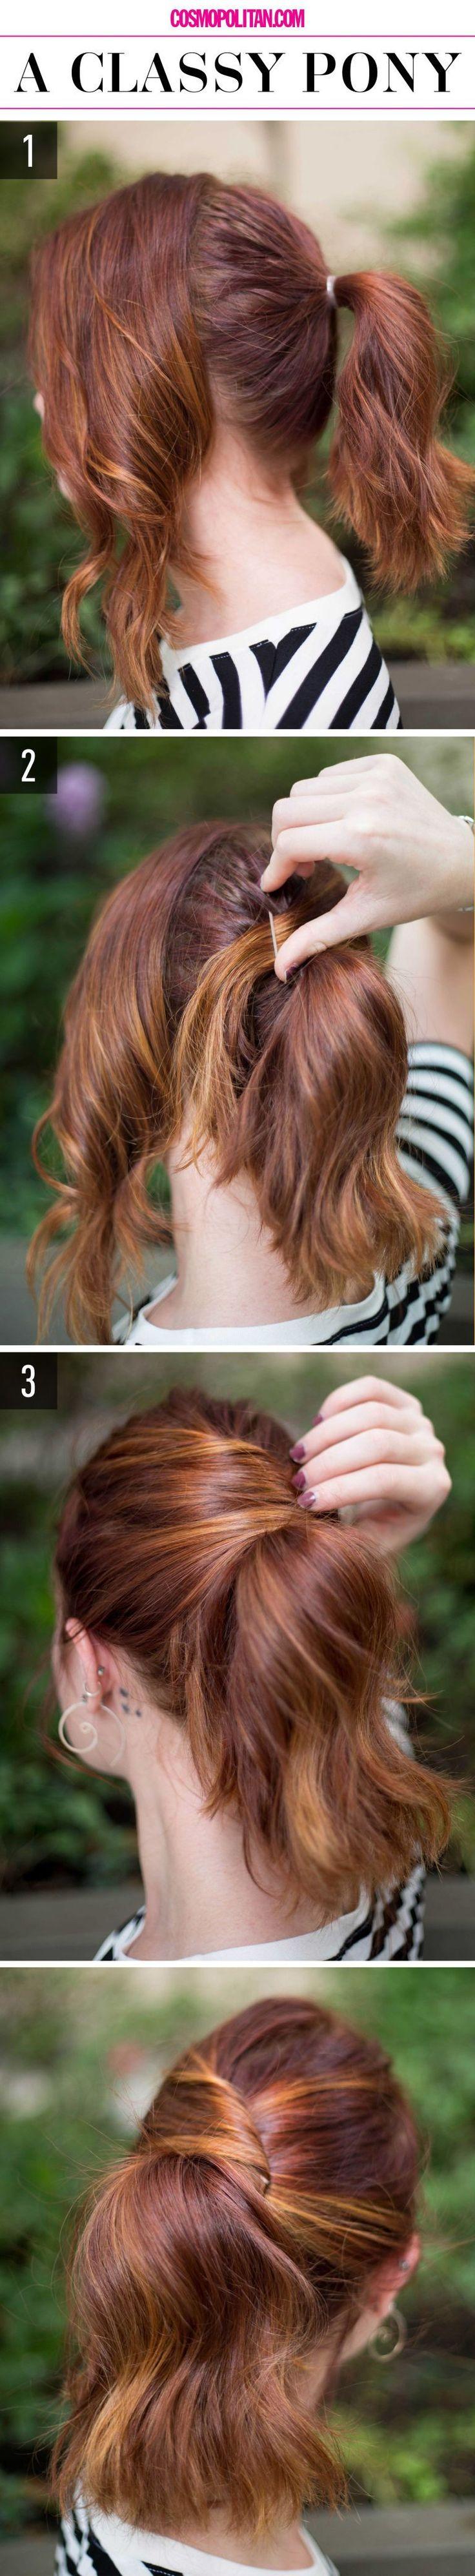 372 best Hairdo Idea images on Pinterest